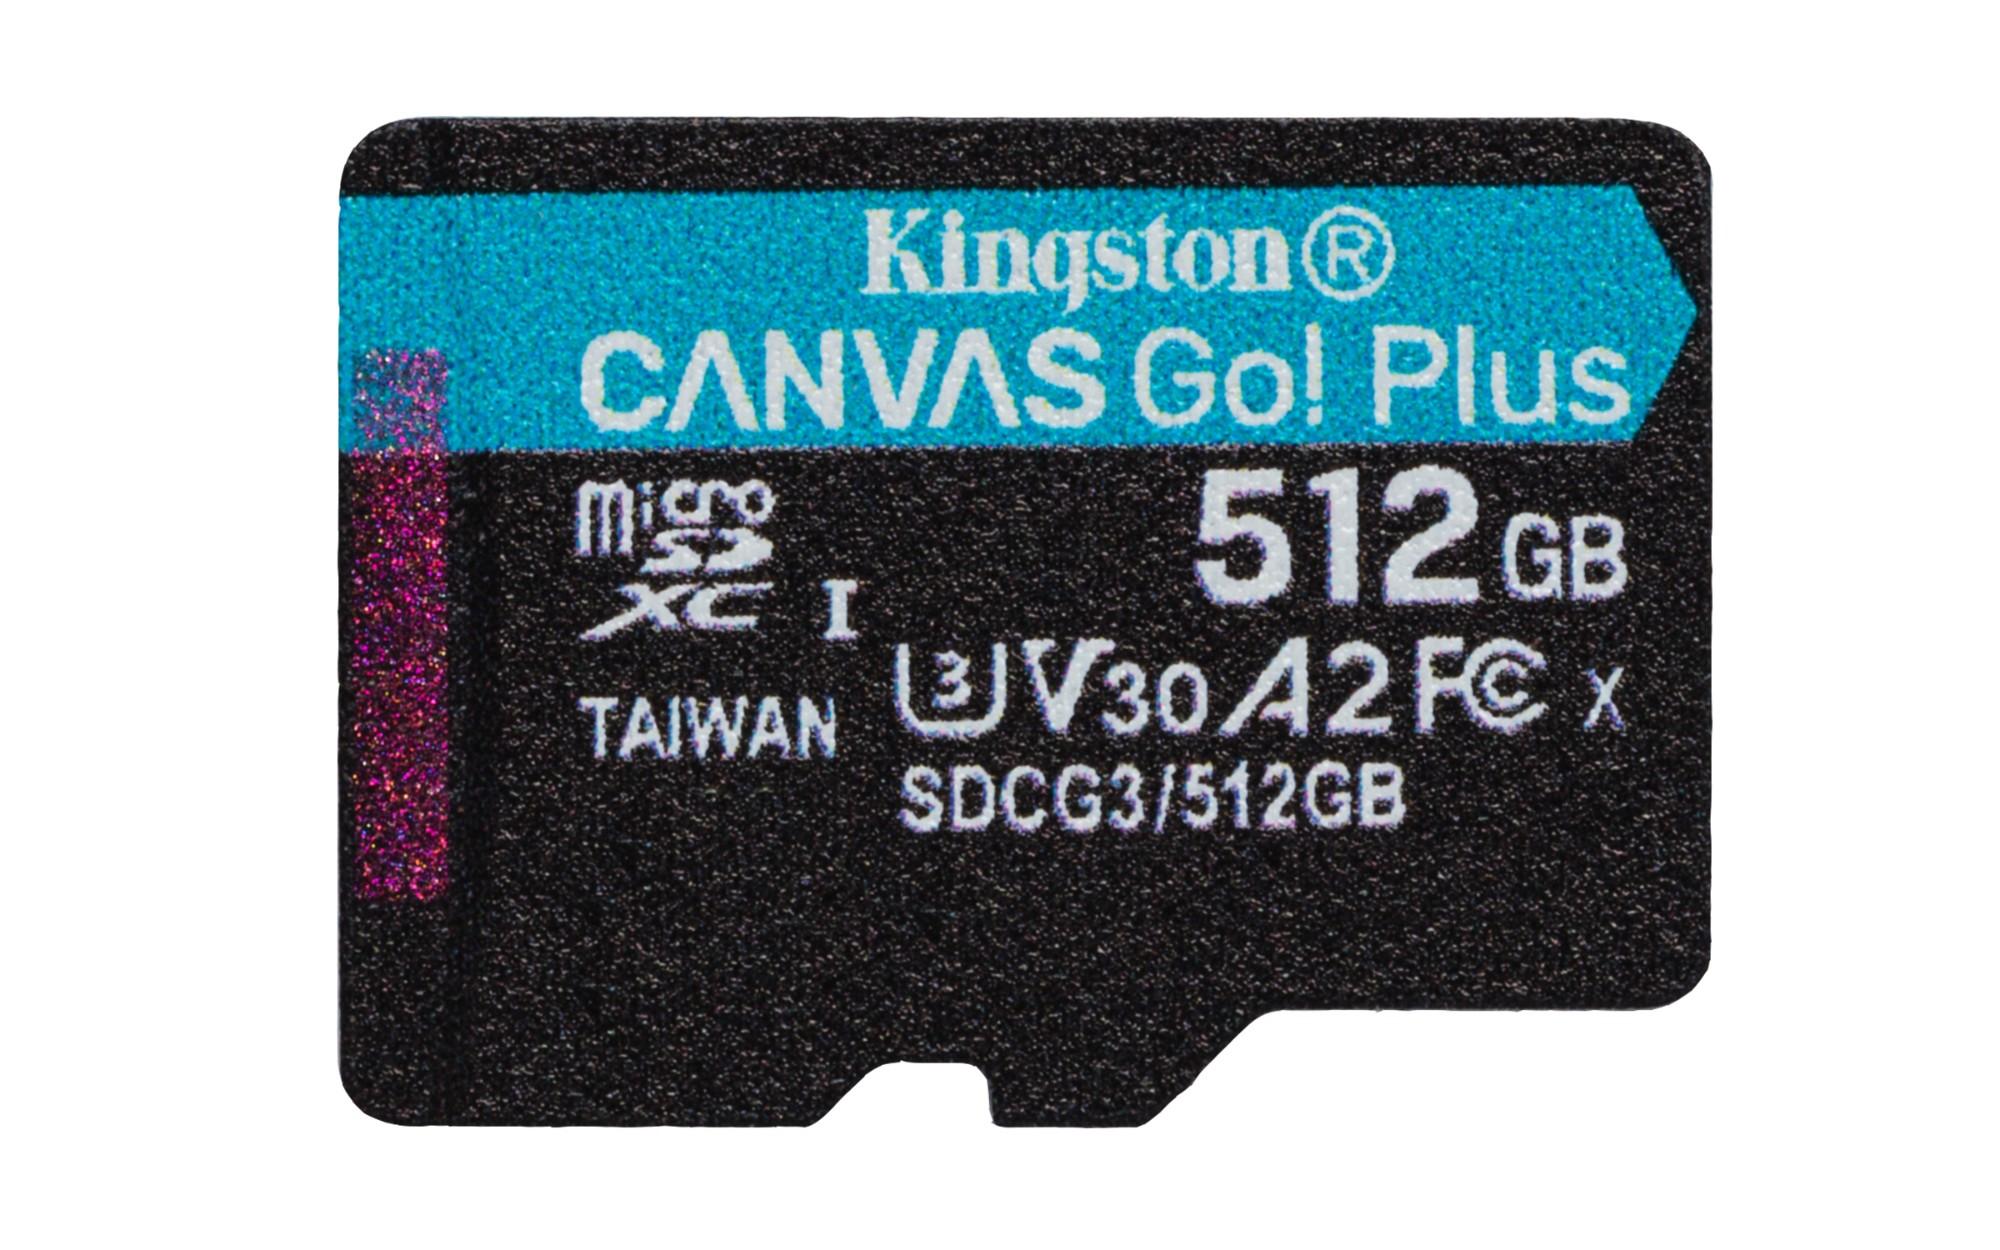 Kingston Technology Canvas Go! Plus memory card 512 GB MicroSD Class 10 UHS-I